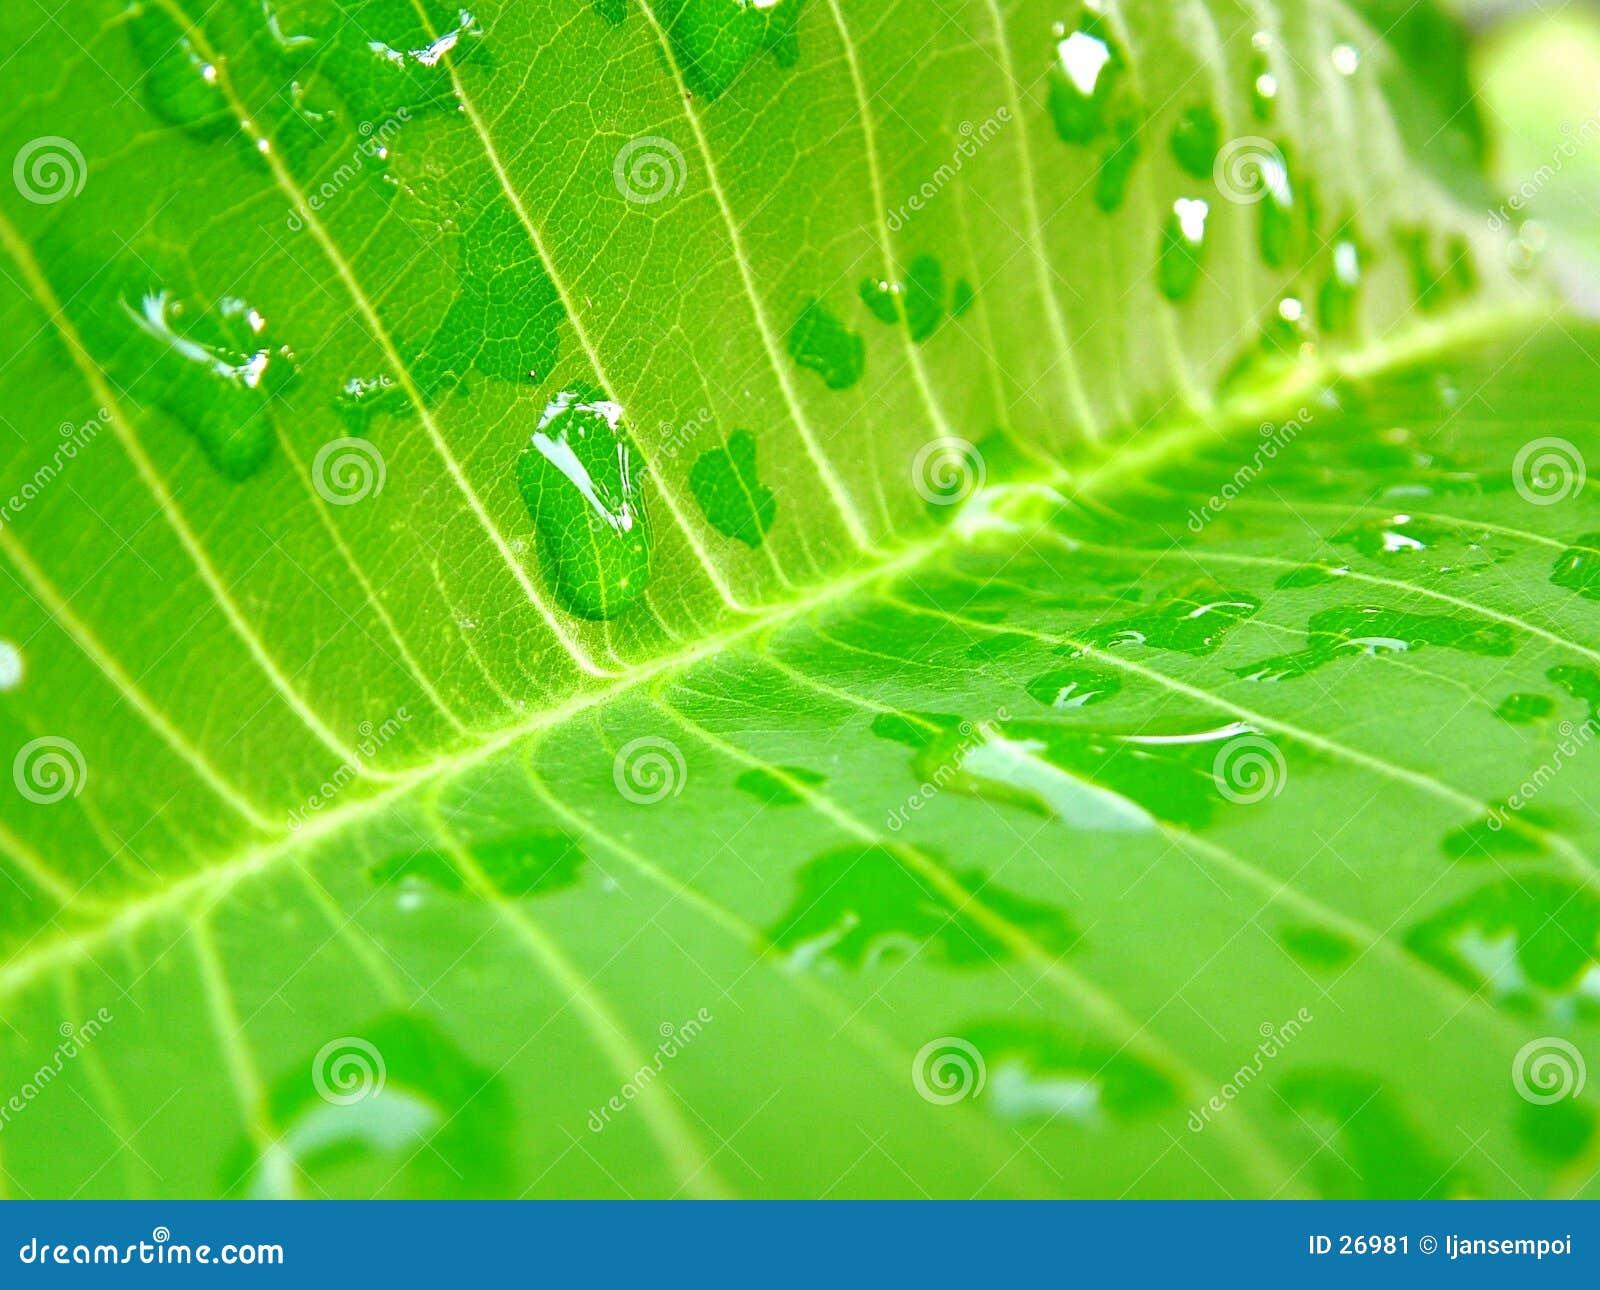 Waterdrops liści